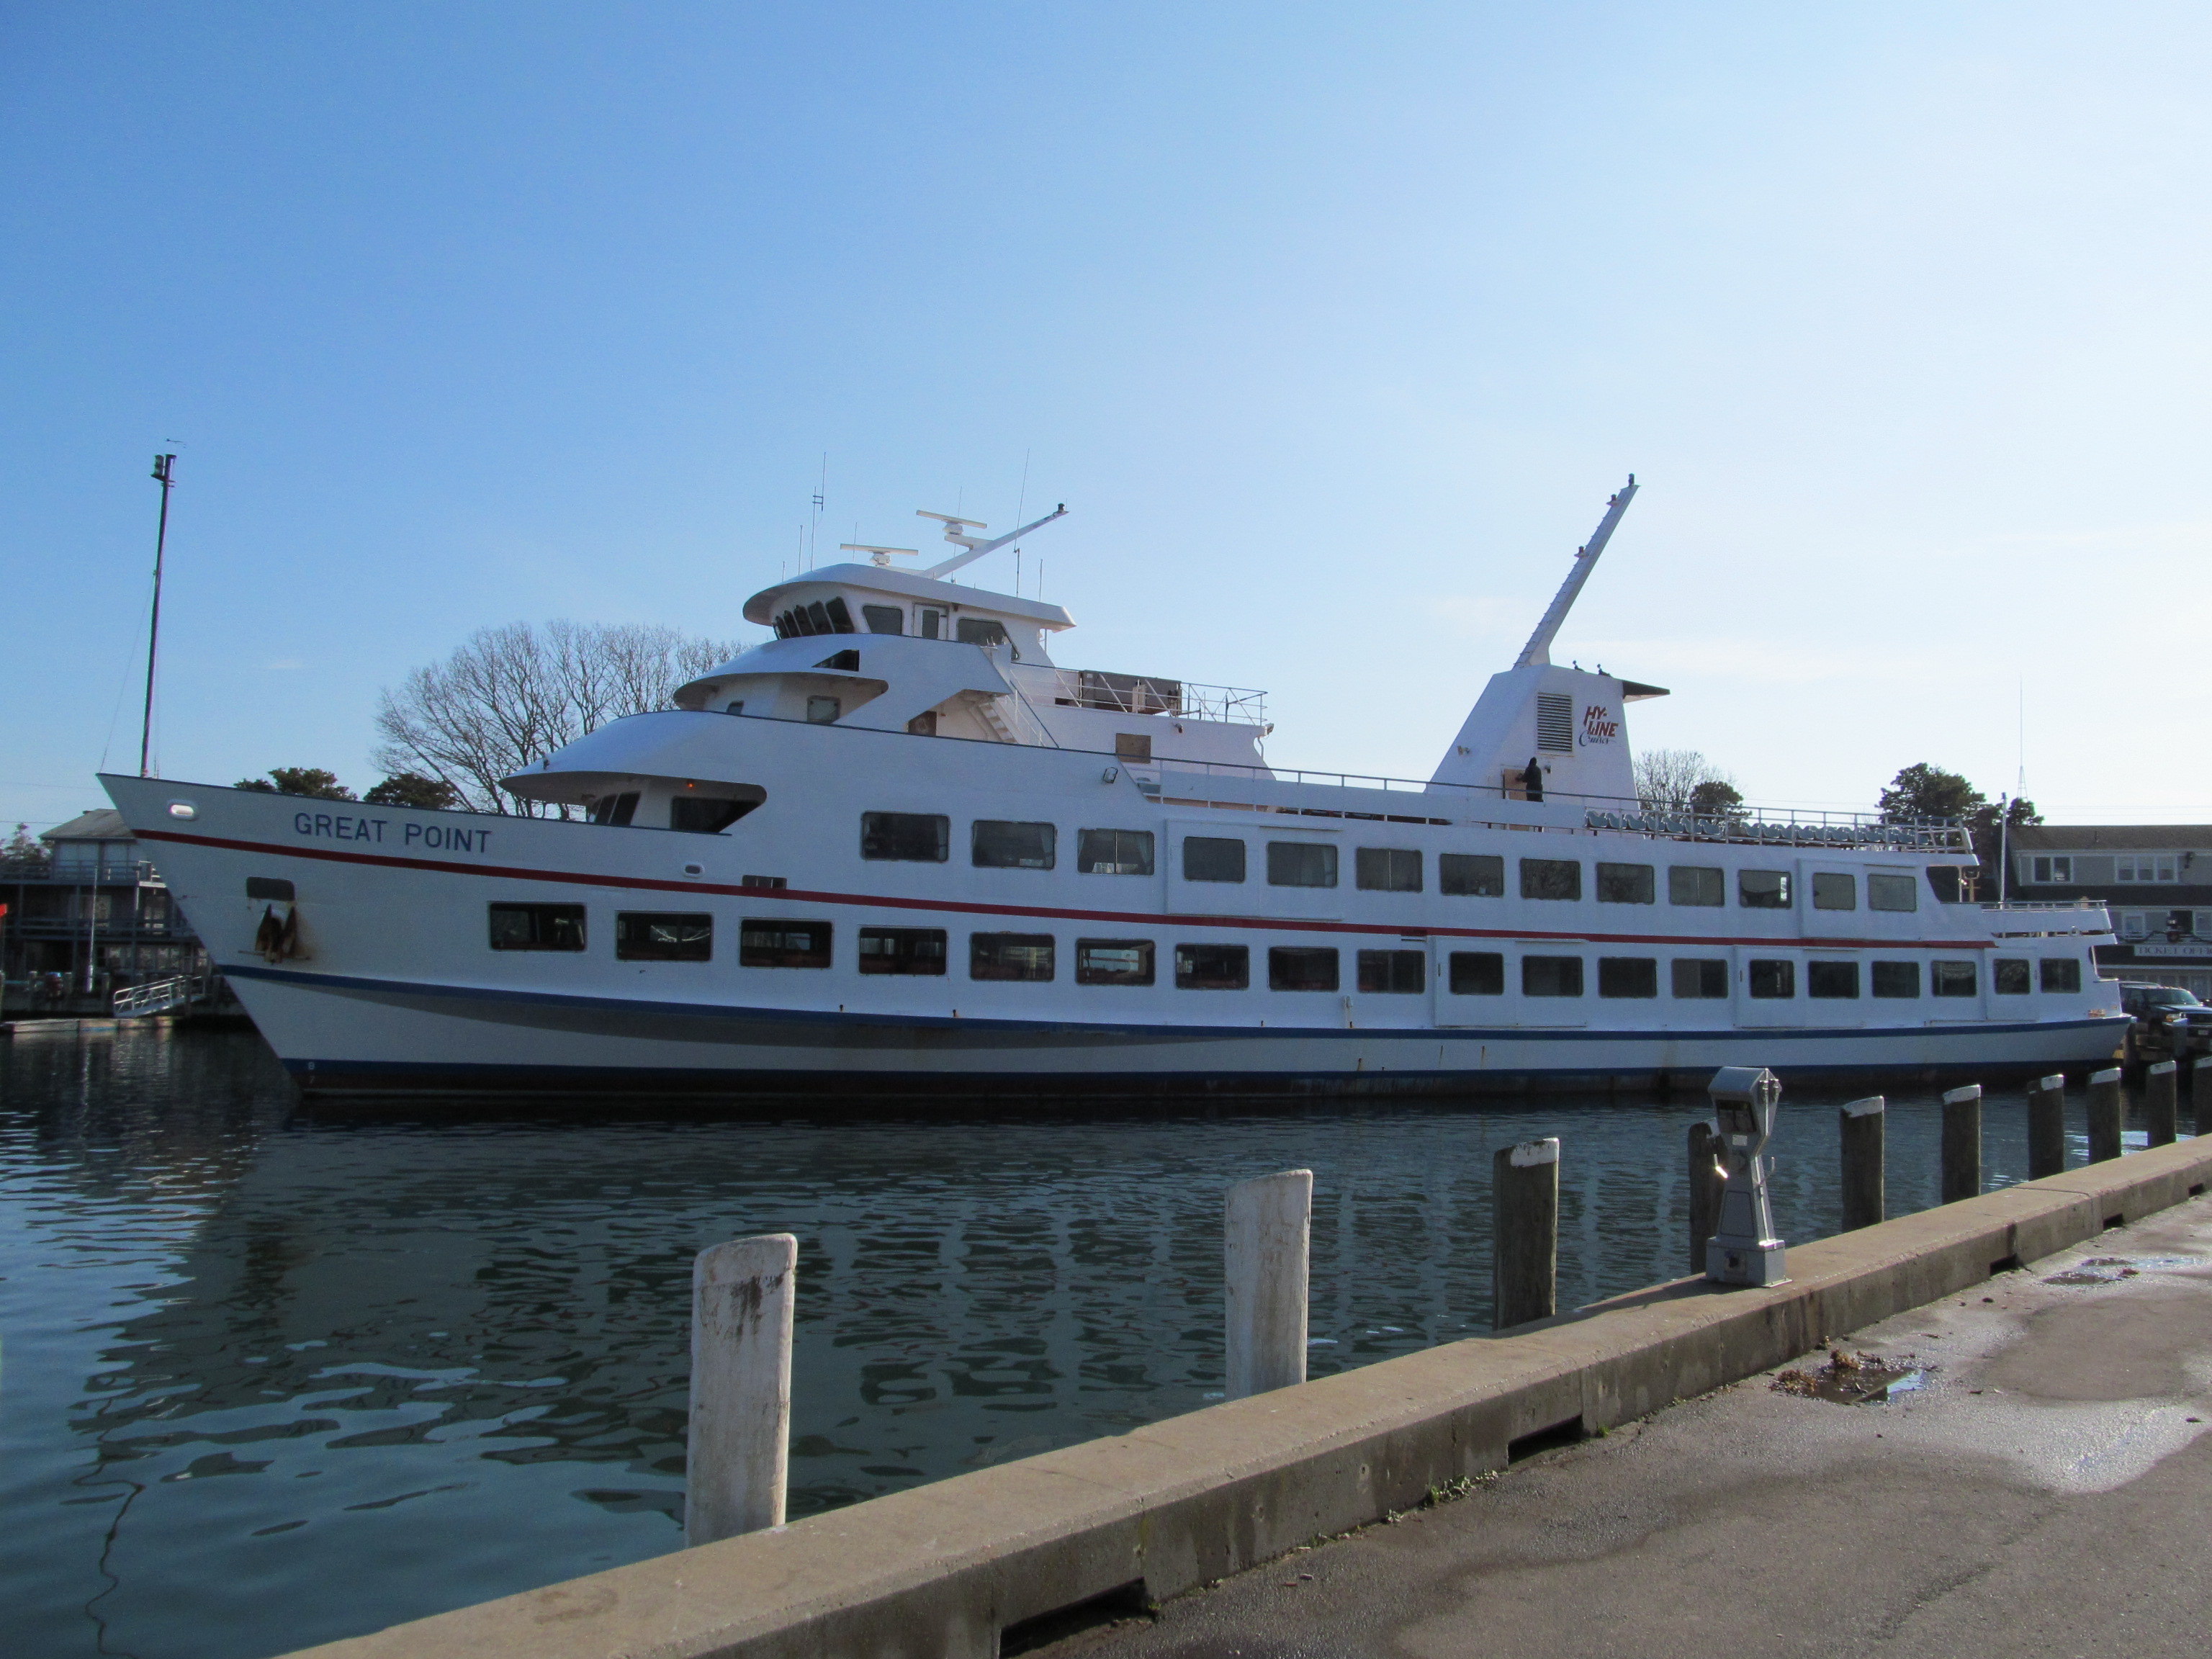 hy-line cruises - wikipedia